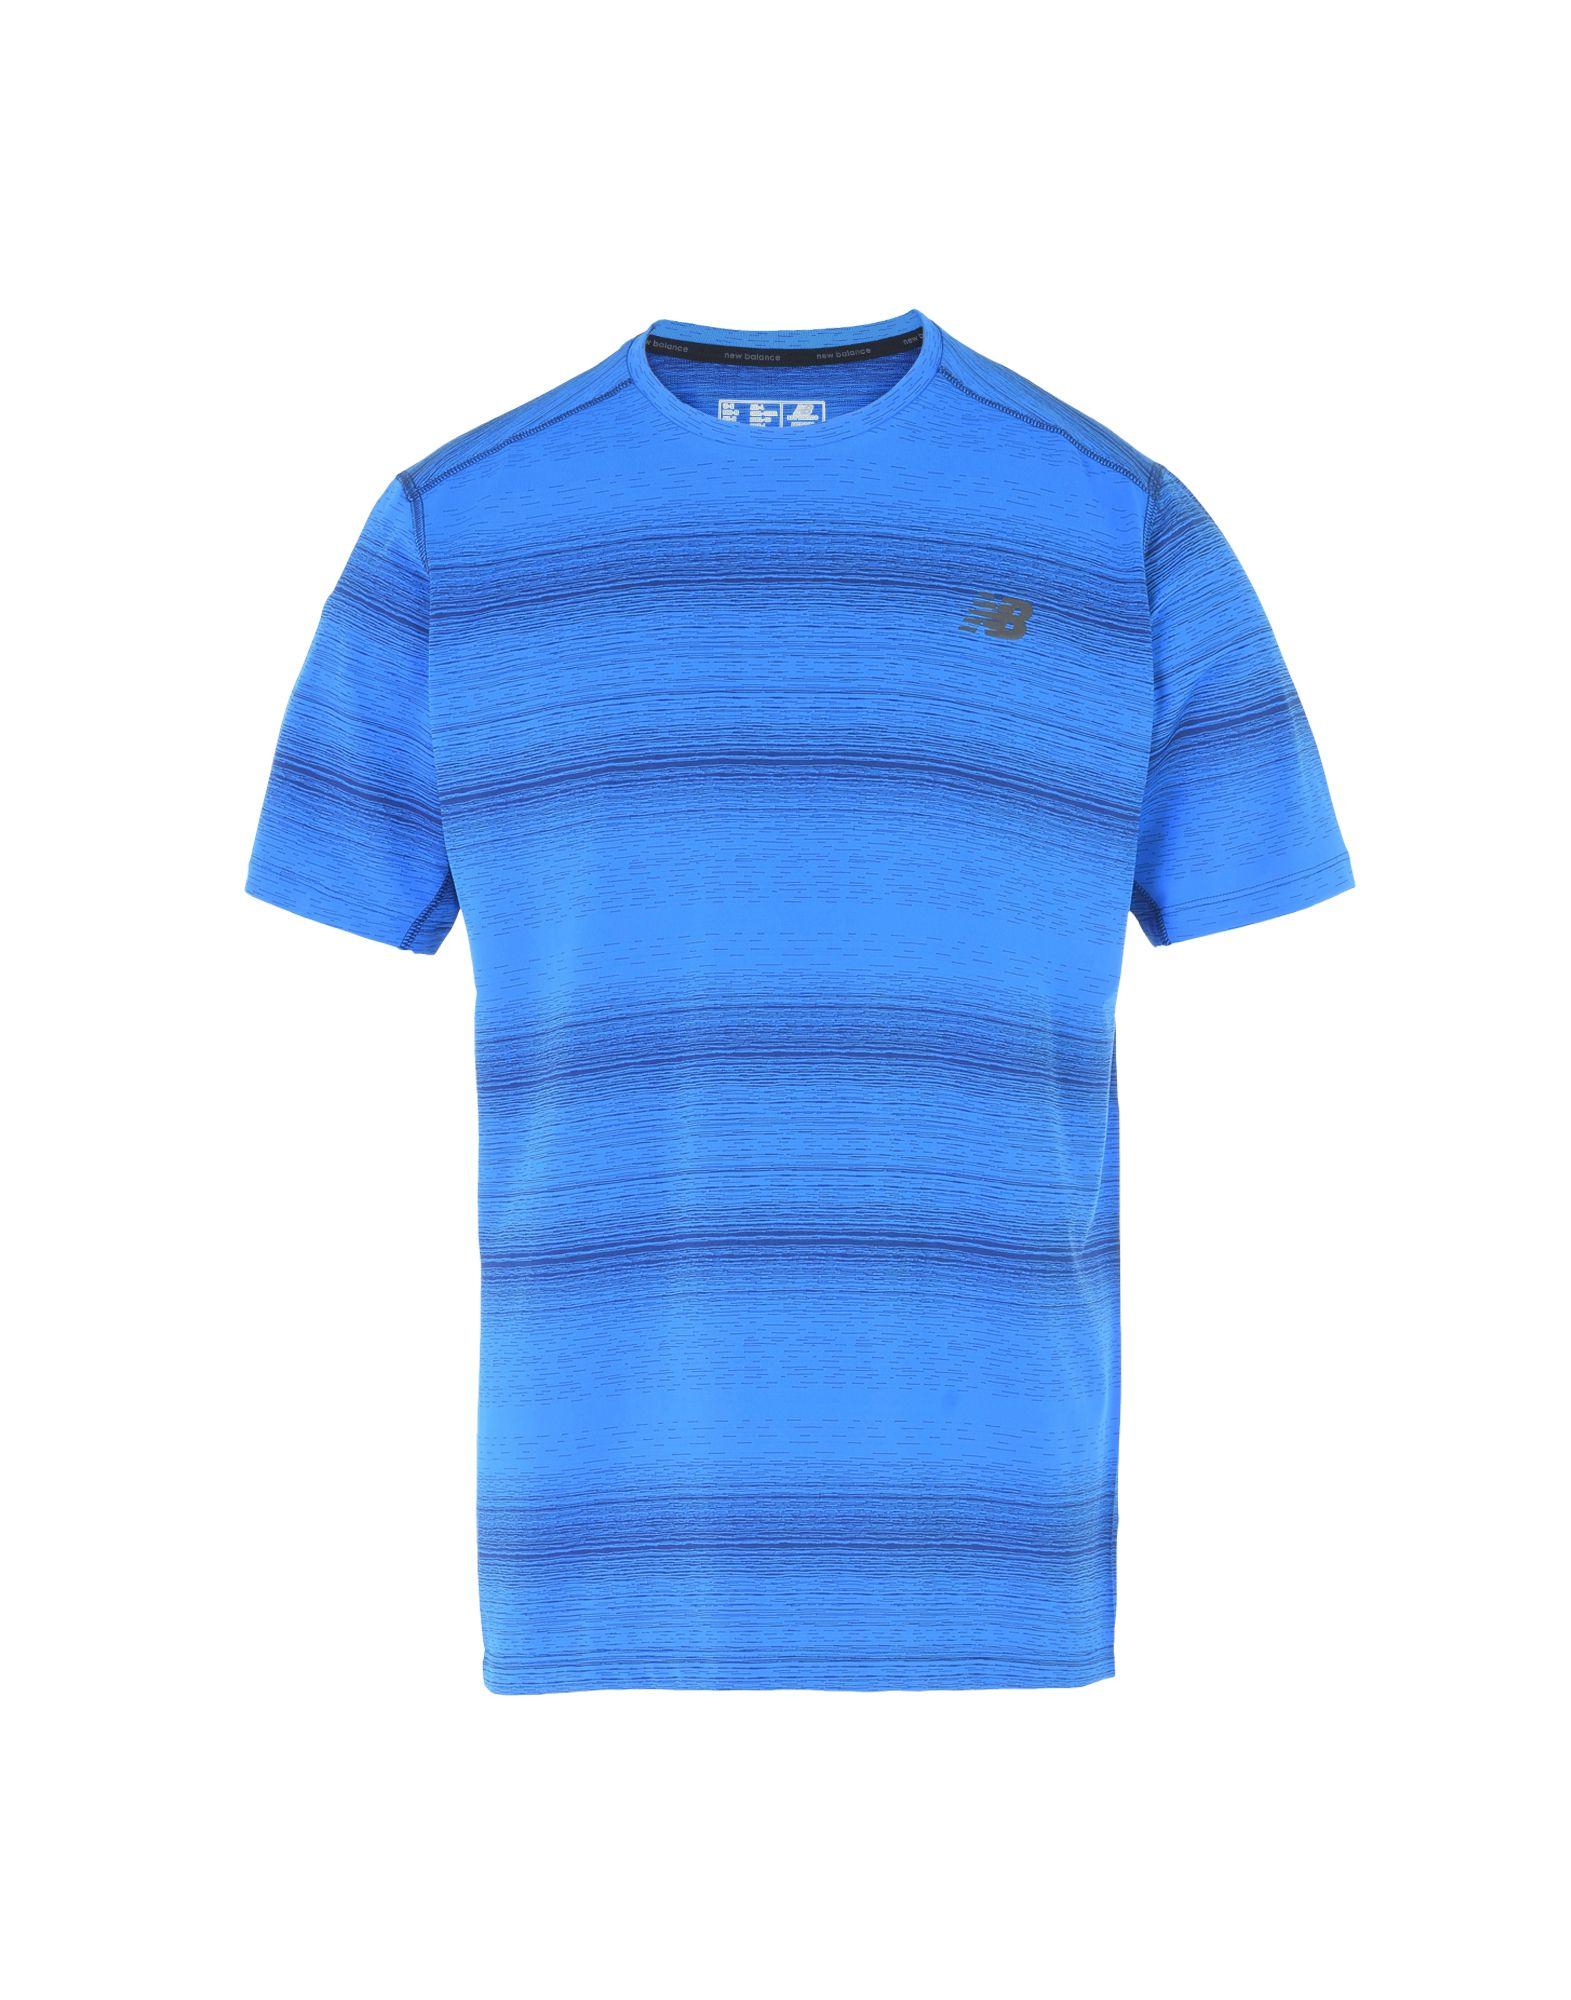 2fc15faf69fd5 New Balance Kairosport Tee - T-Shirt - Men New Balance T-Shirts online on  YOOX United States - 12018100